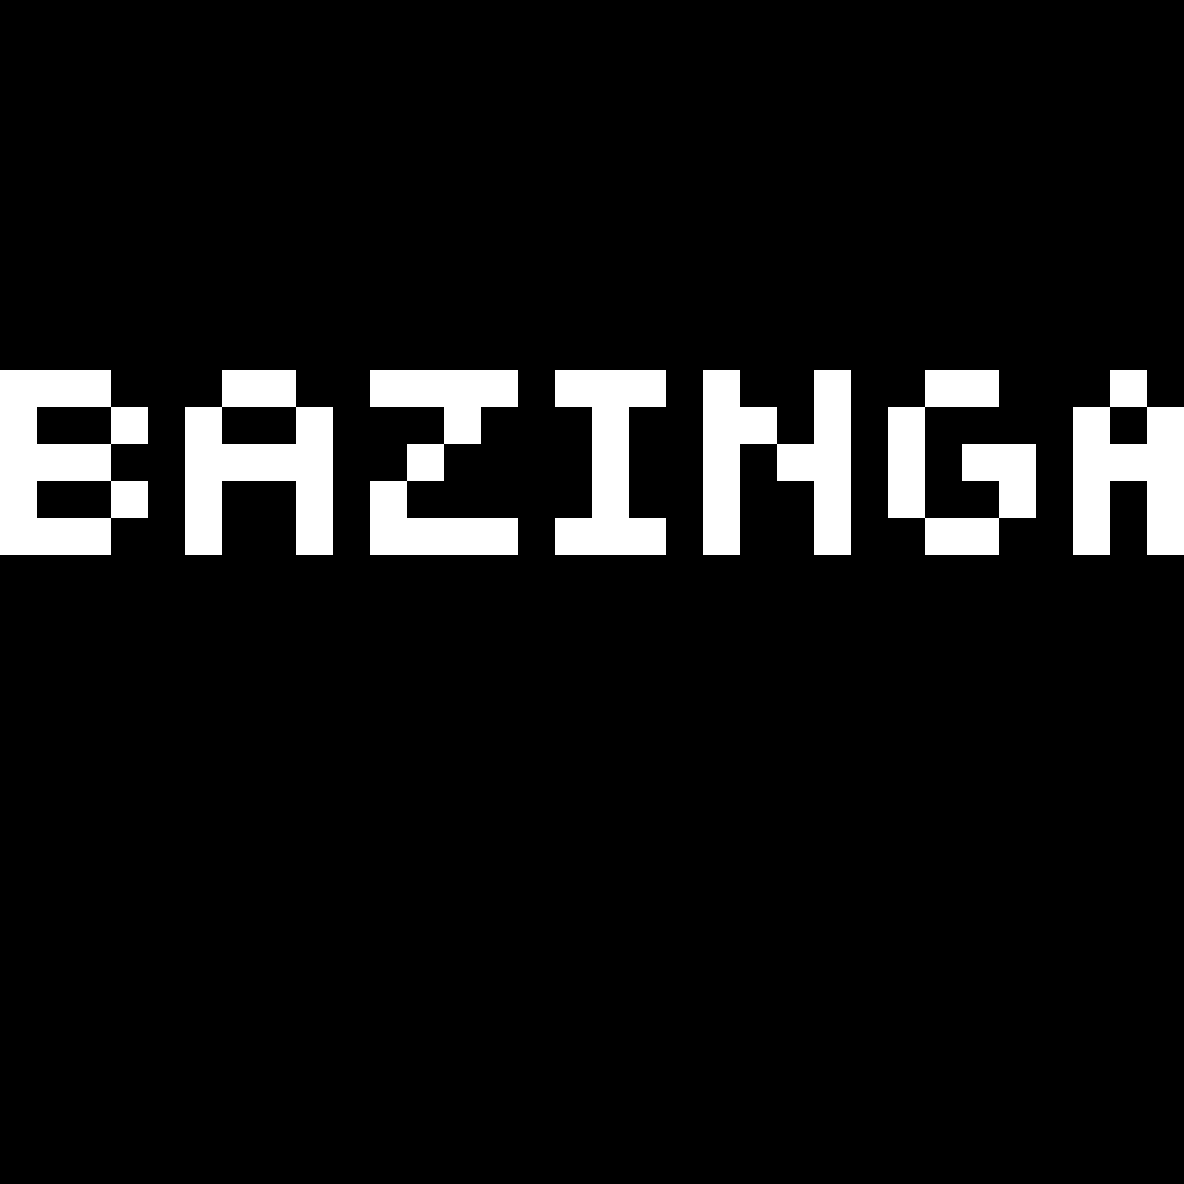 BAZINGA by ERMauser0425